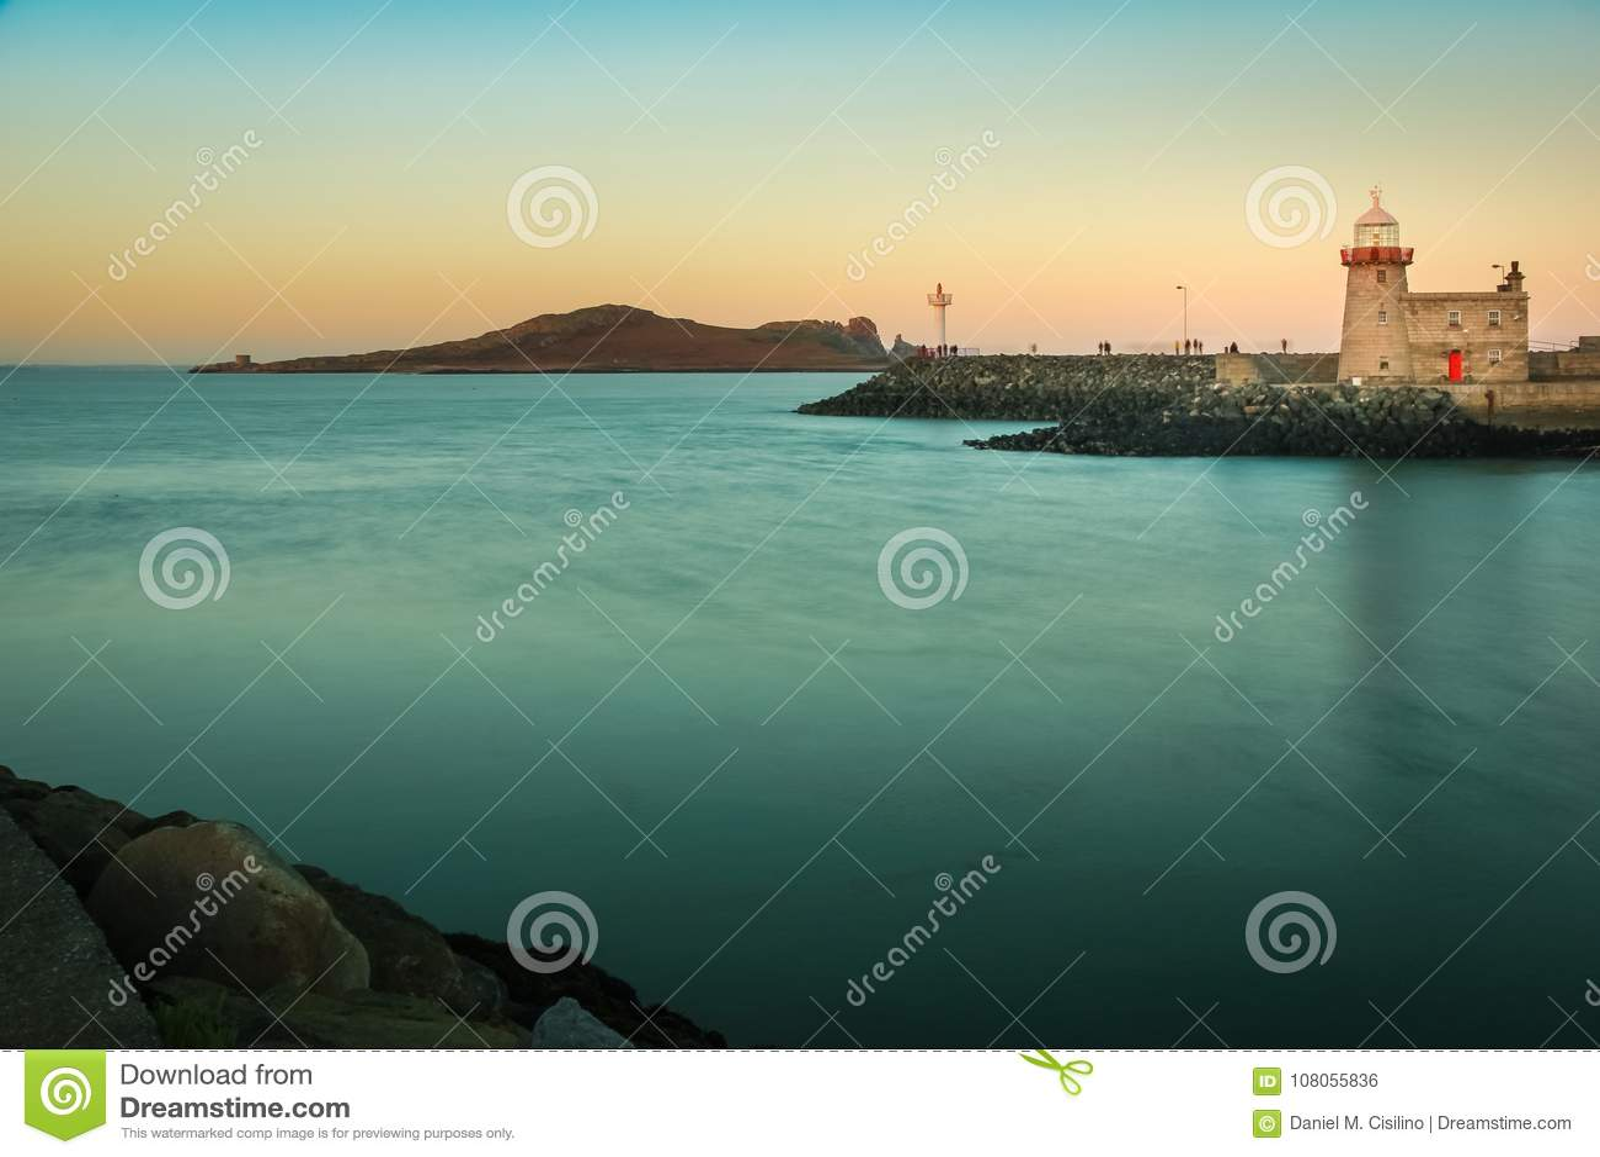 Harbour lighthouse at sunset. Howth. Dublin. Ireland